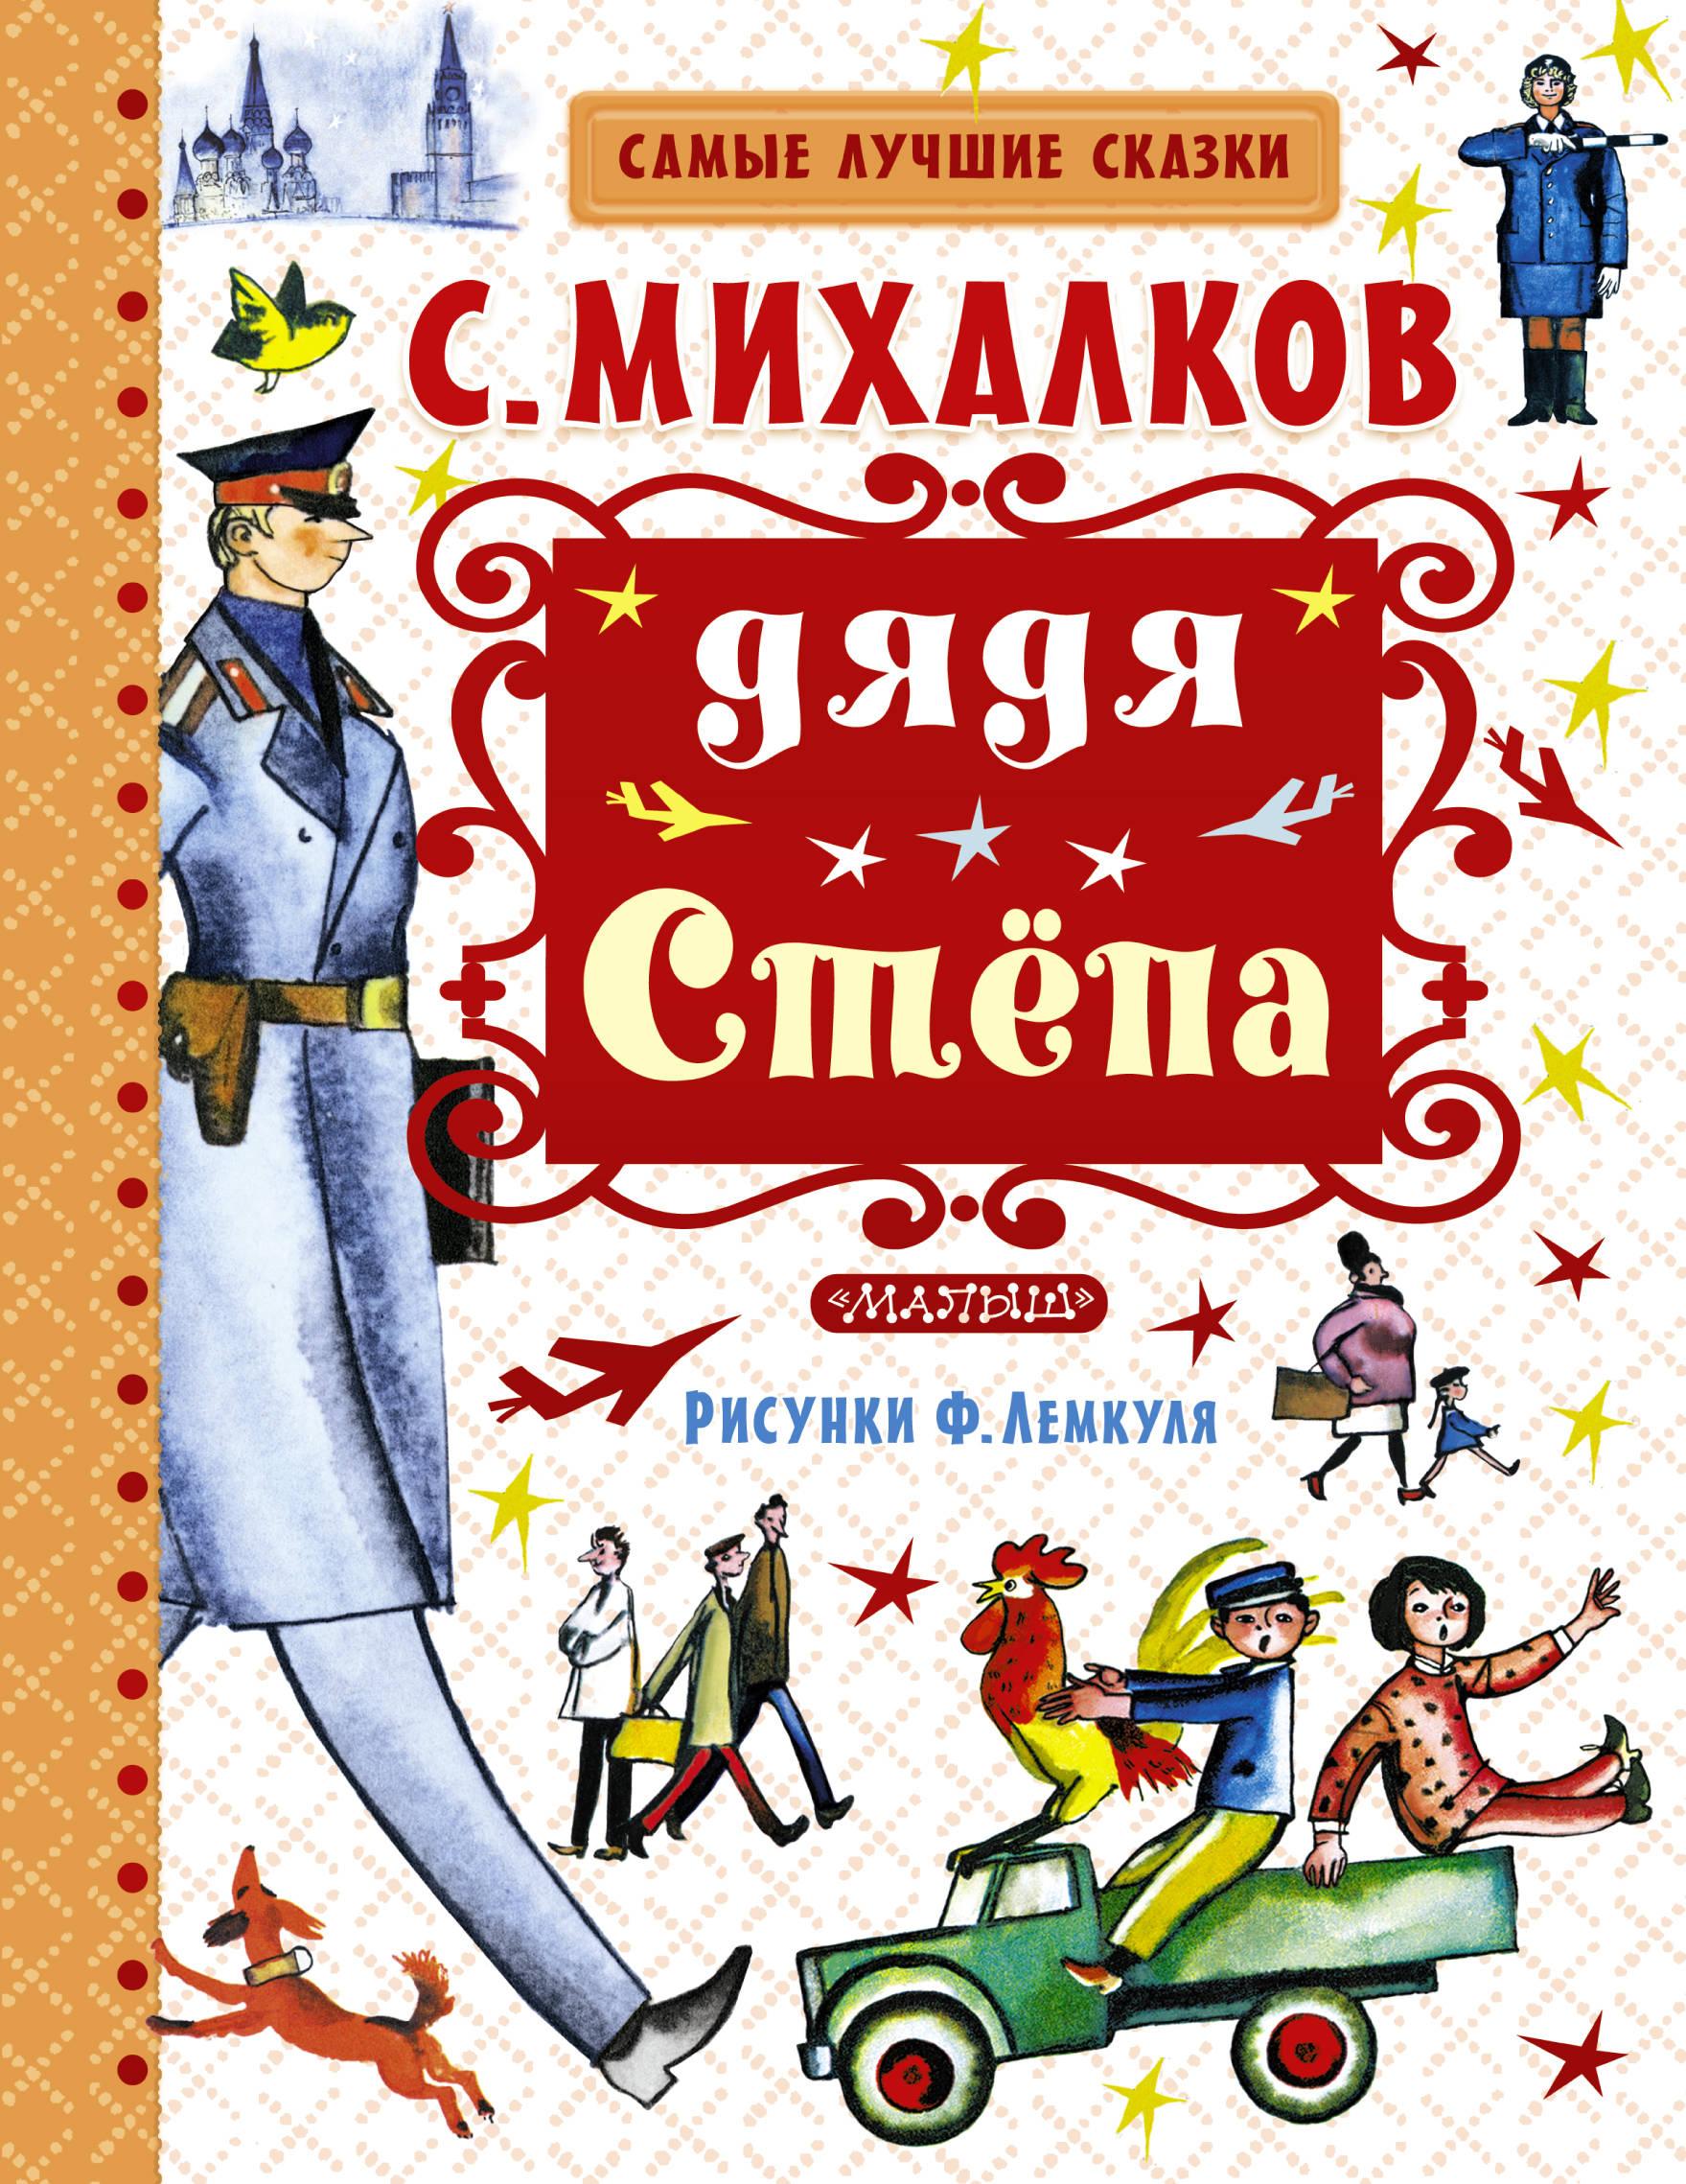 Михалков С.В. Дядя Стёпа сергей михалков дядя стёпа